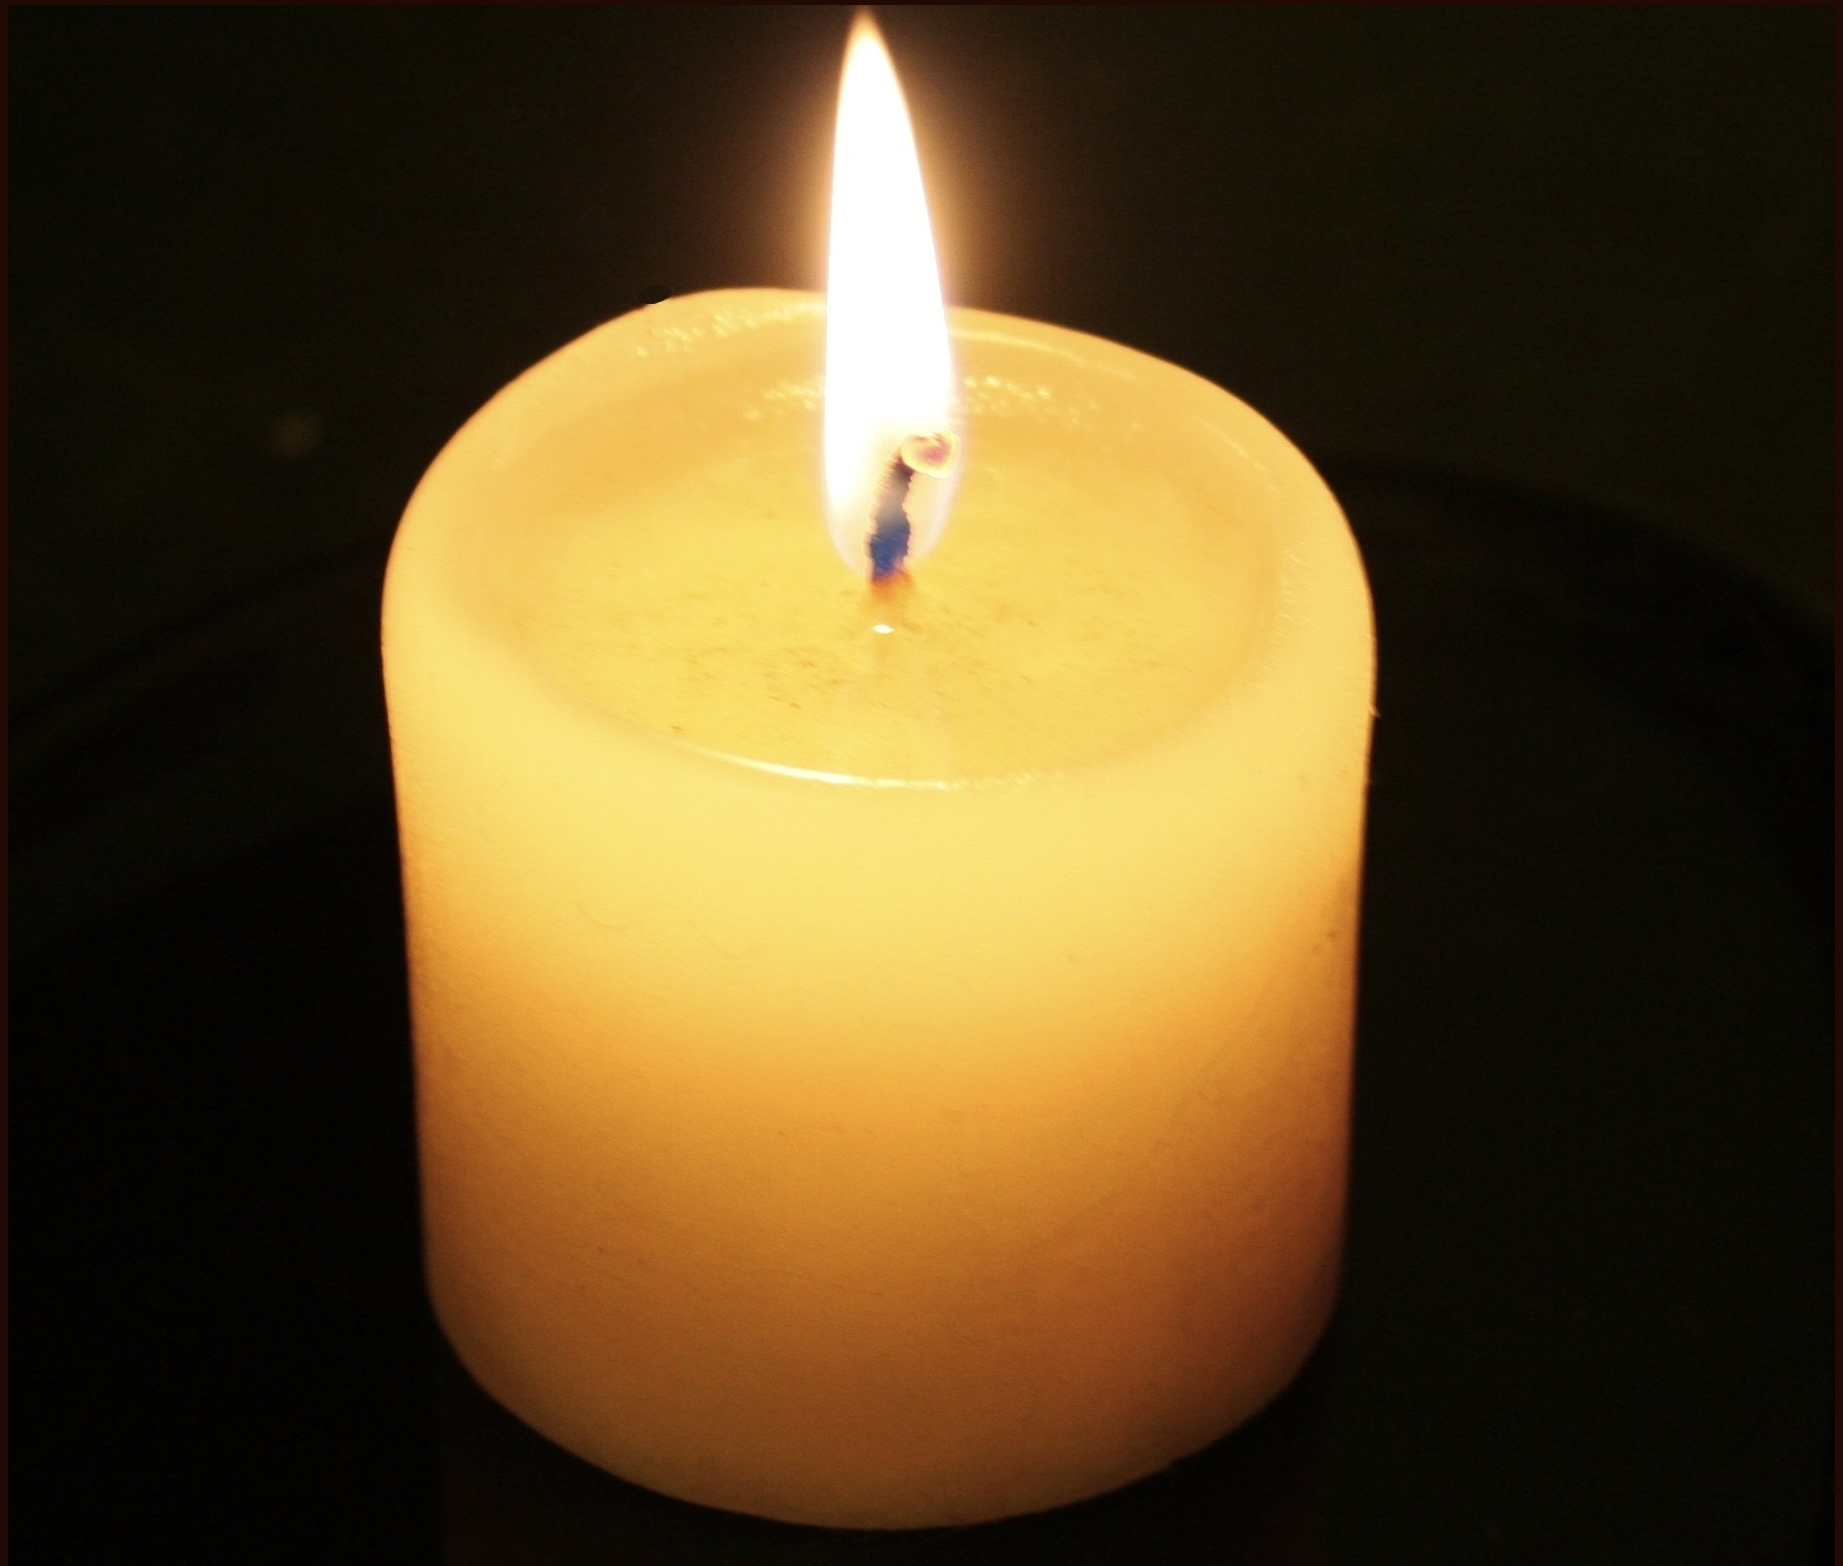 Candle Light Wallpaper HD Freetopwallpapercom 1843x1566